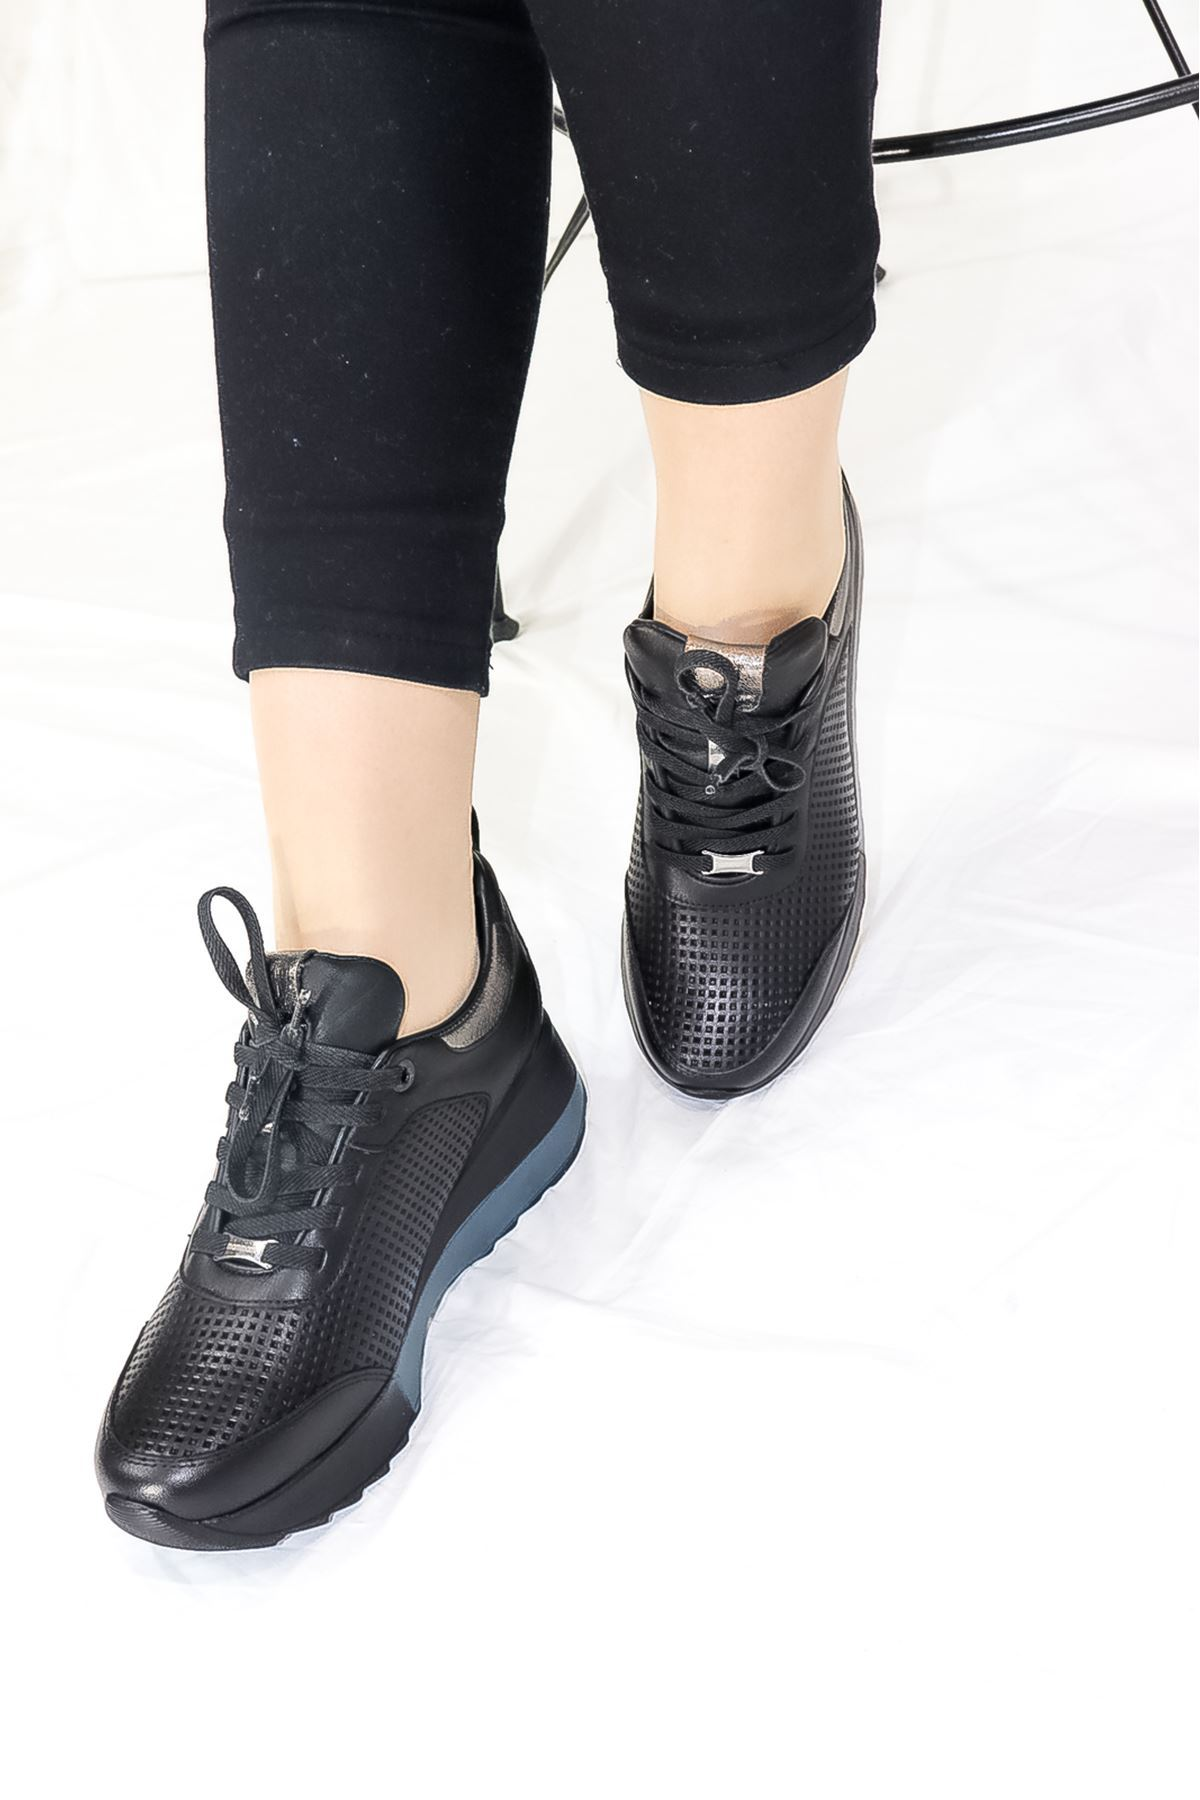 Mammamia - D21YA - 3265-B Siyah spor Kadın Ayakkabısı